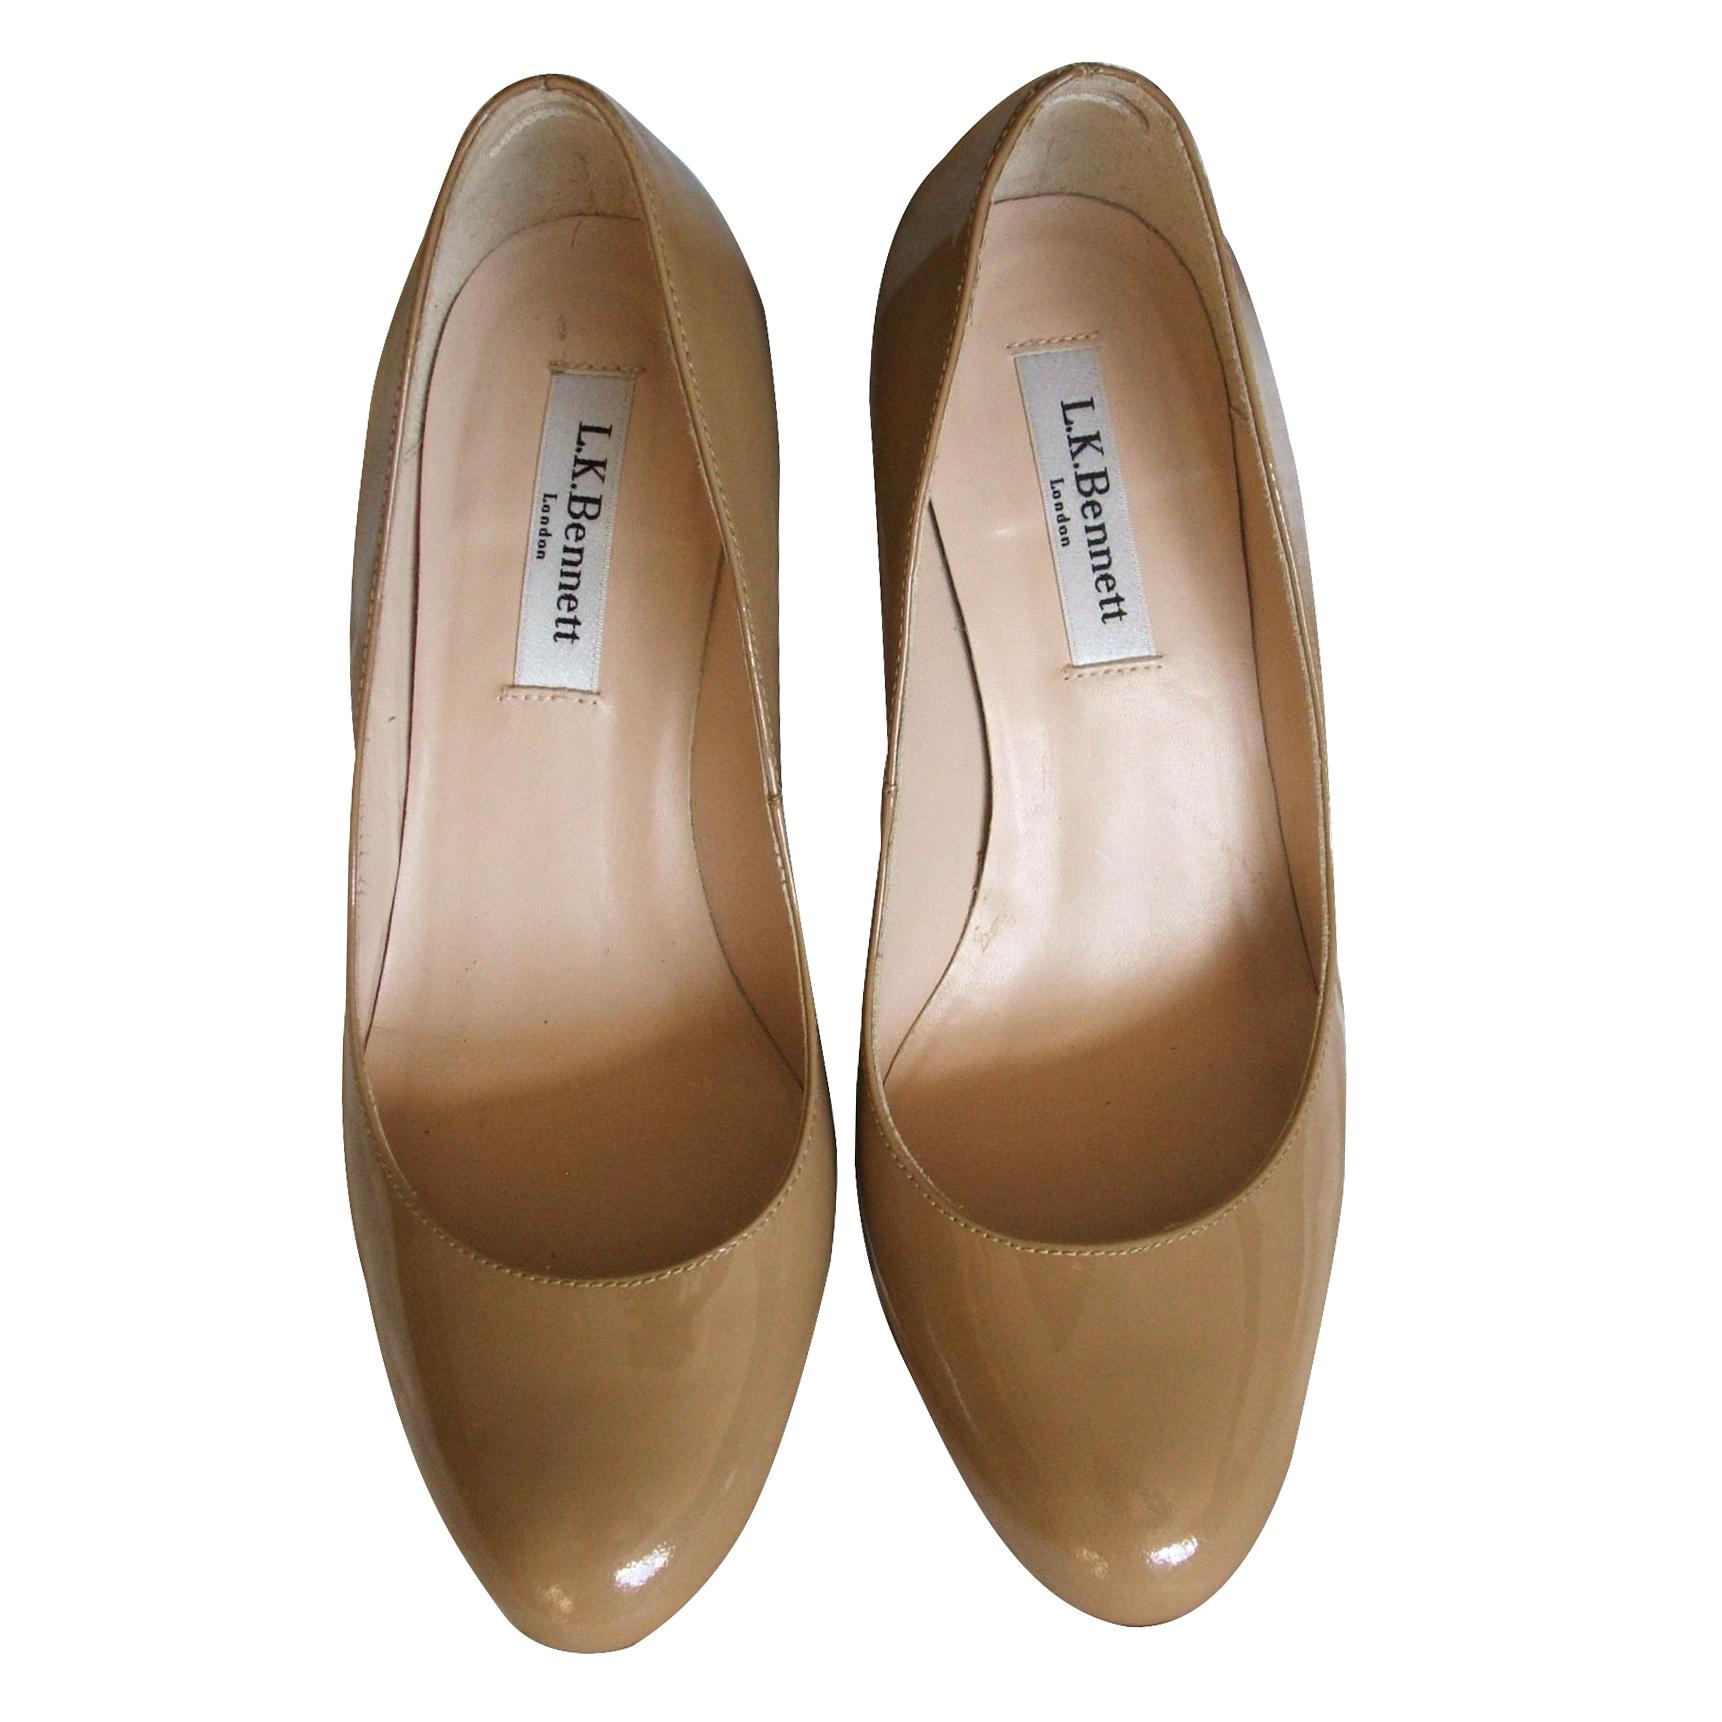 6594ad6504 Lk Bennett Sybila Patent Leather Courts Size 36052433   HEWI London